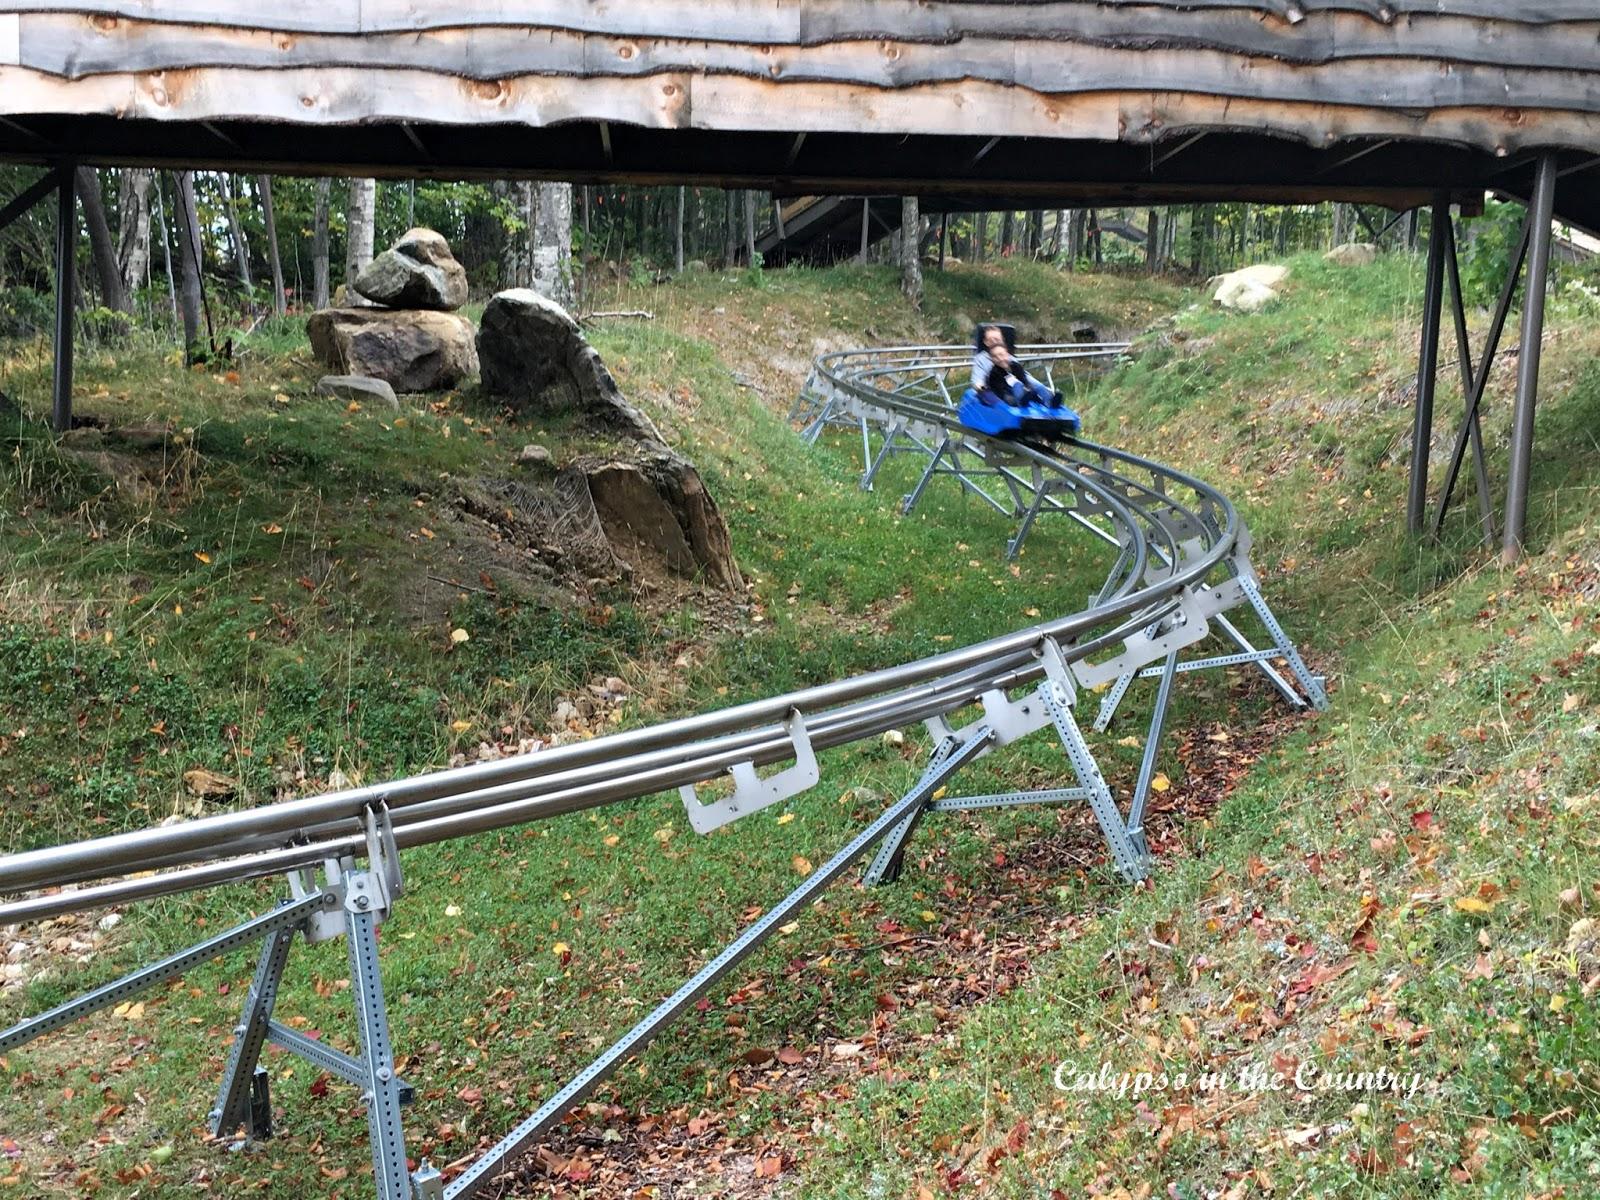 Beast Rollercoaster in Killingon Vermont